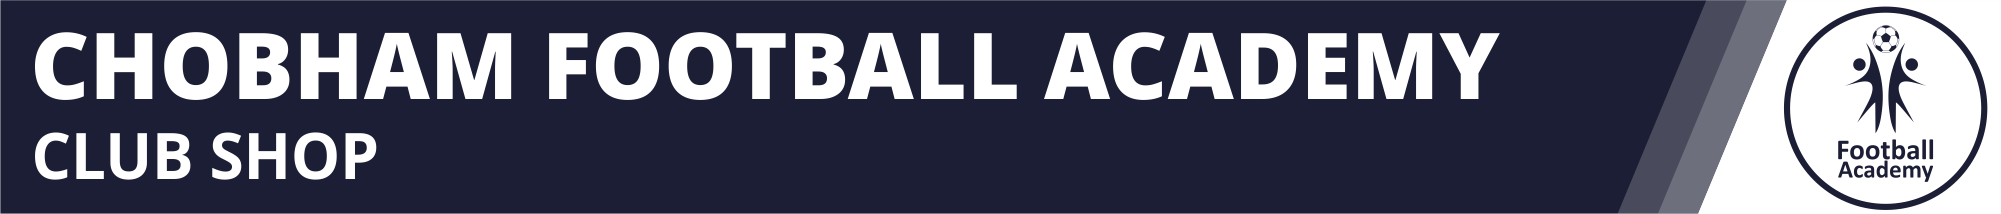 chobham-football-academy-club-shop-banner.png